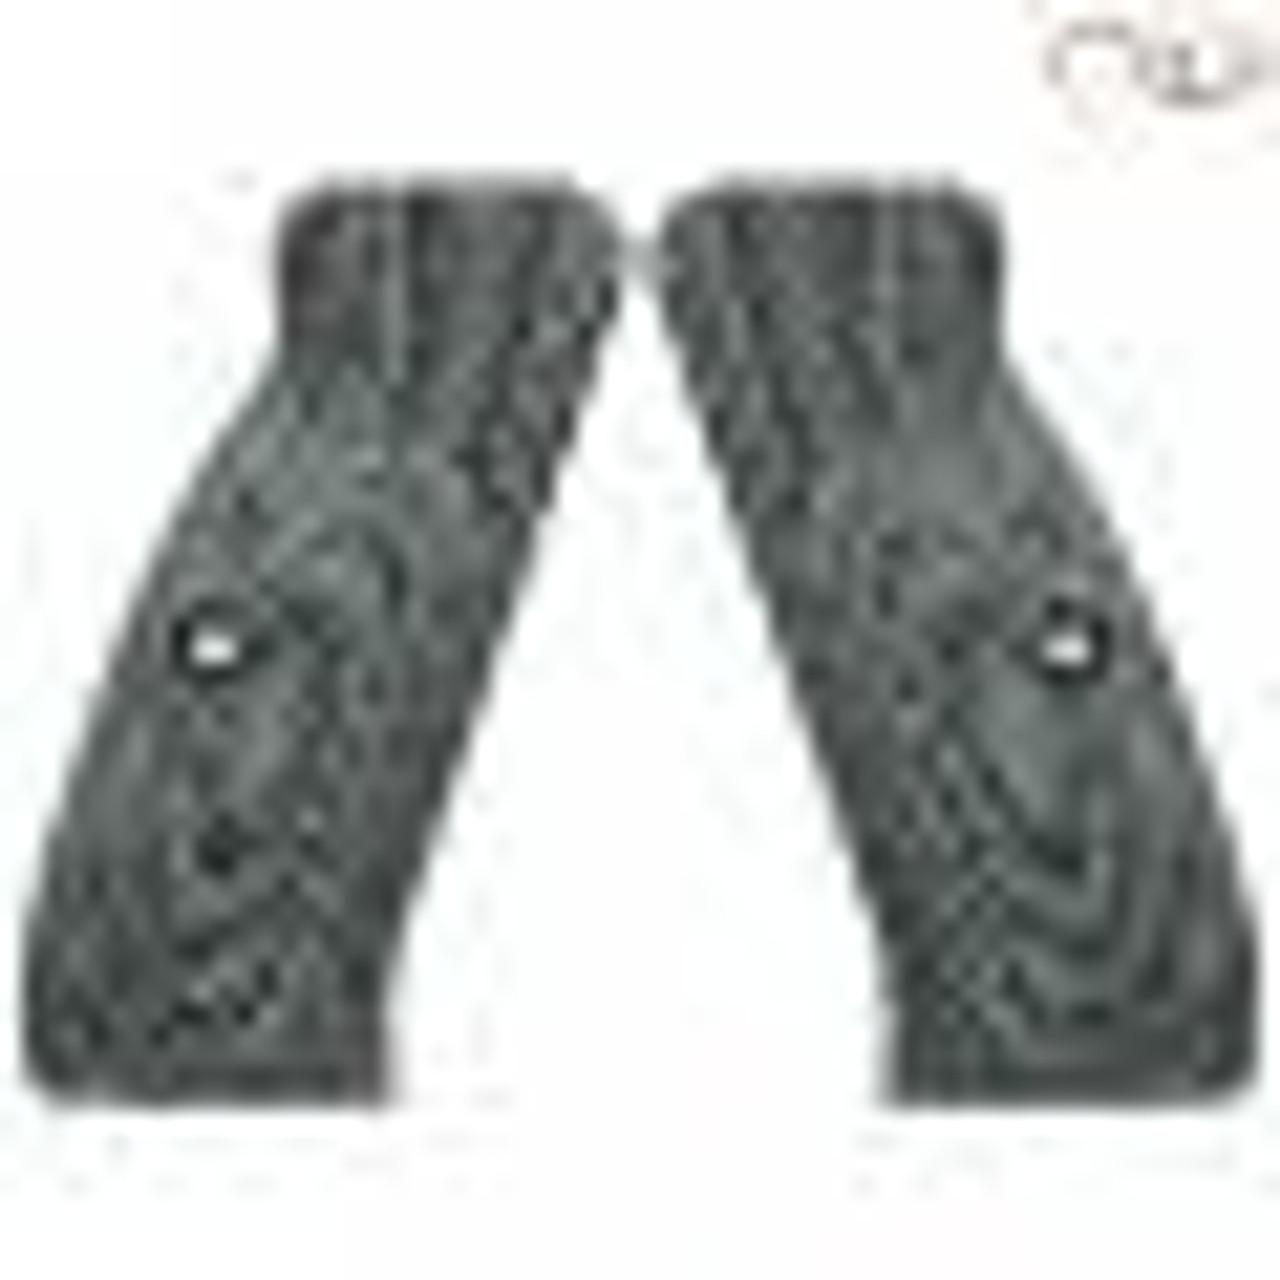 CZ 75 Palm Swell Diamond Backs Black Gray G10